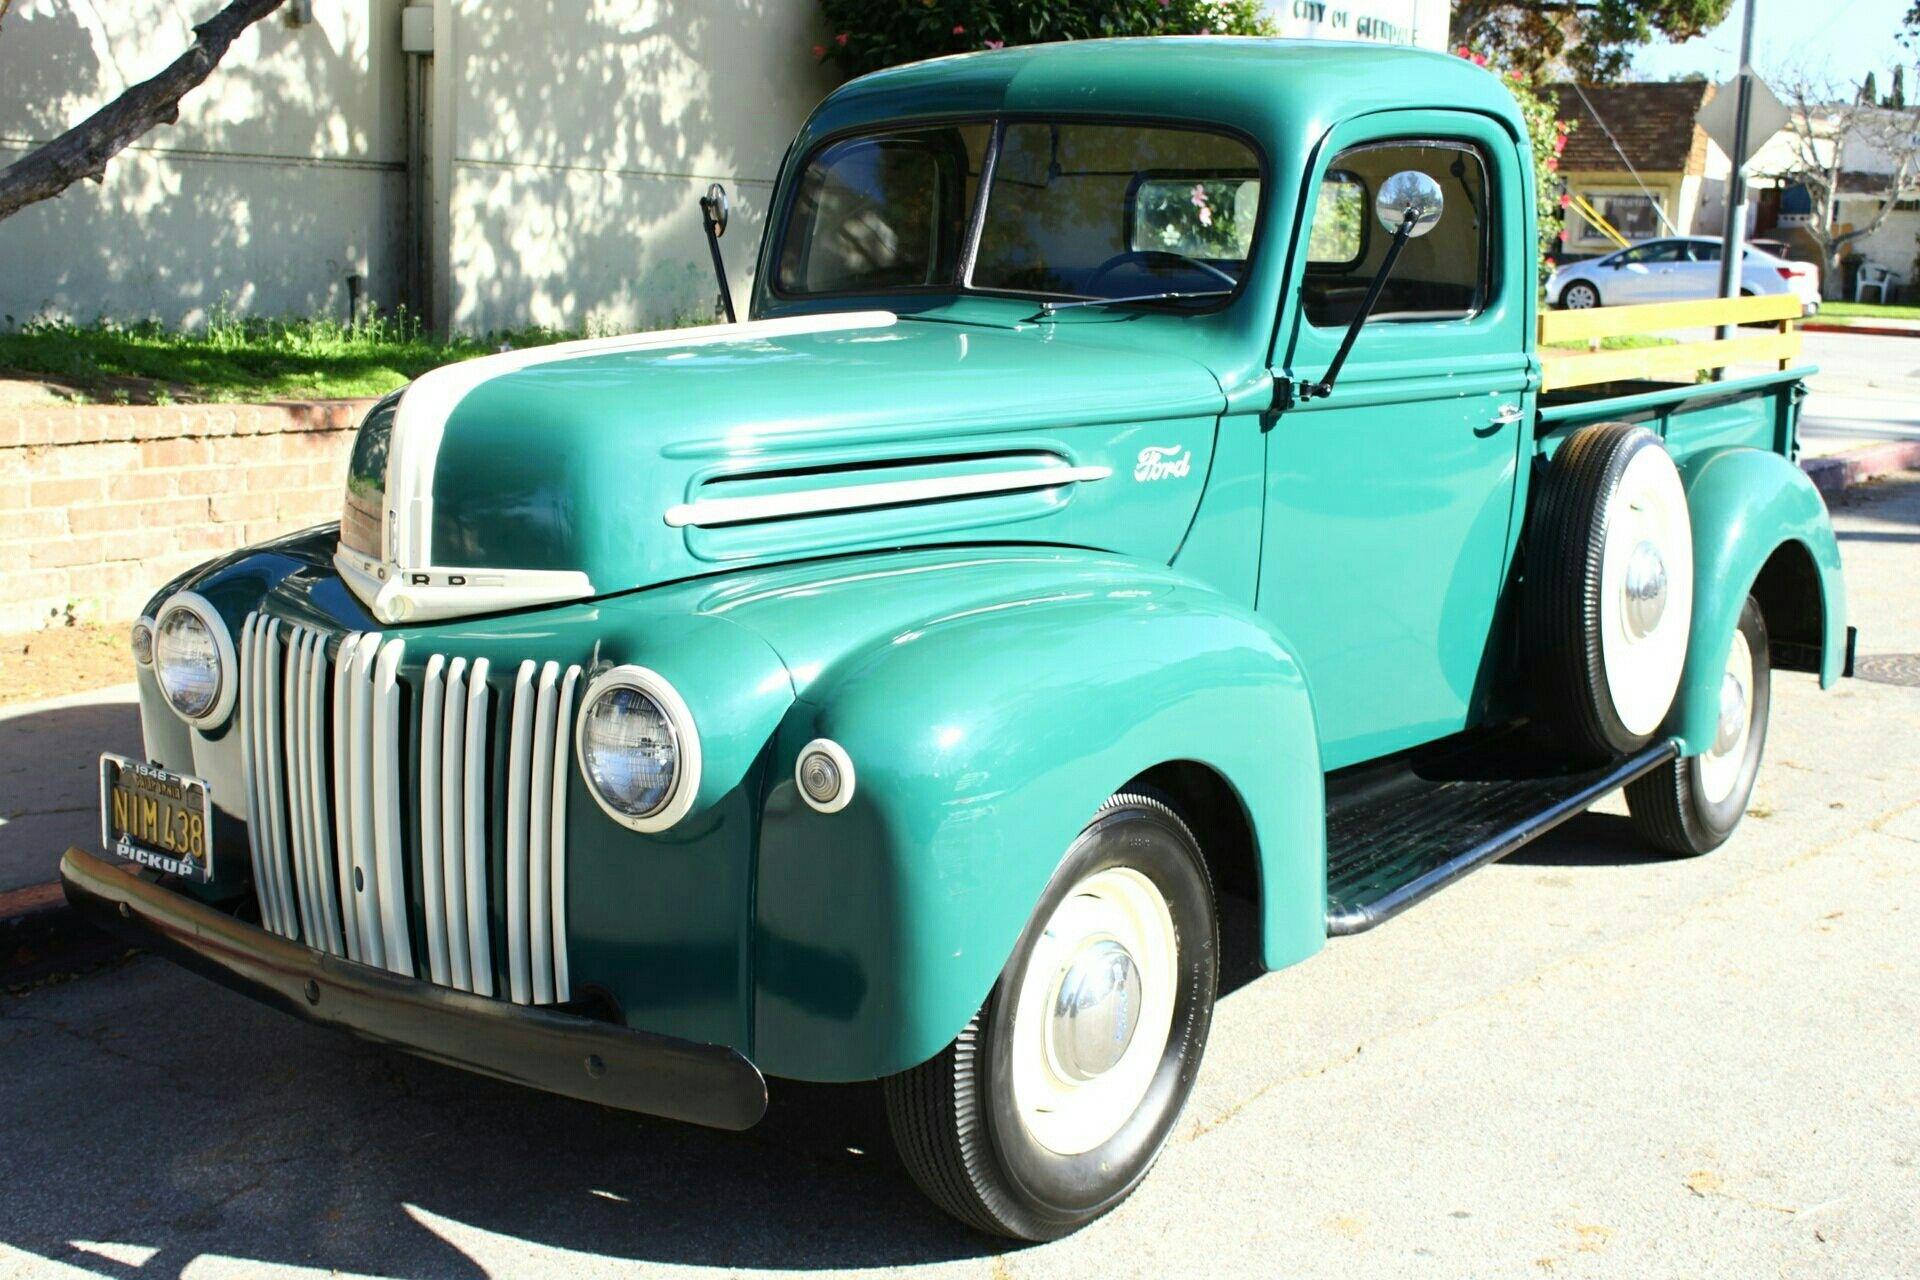 1946 Ford Pickup Classic Cars Trucks Ford Pickup Trucks Old Trucks For Sale